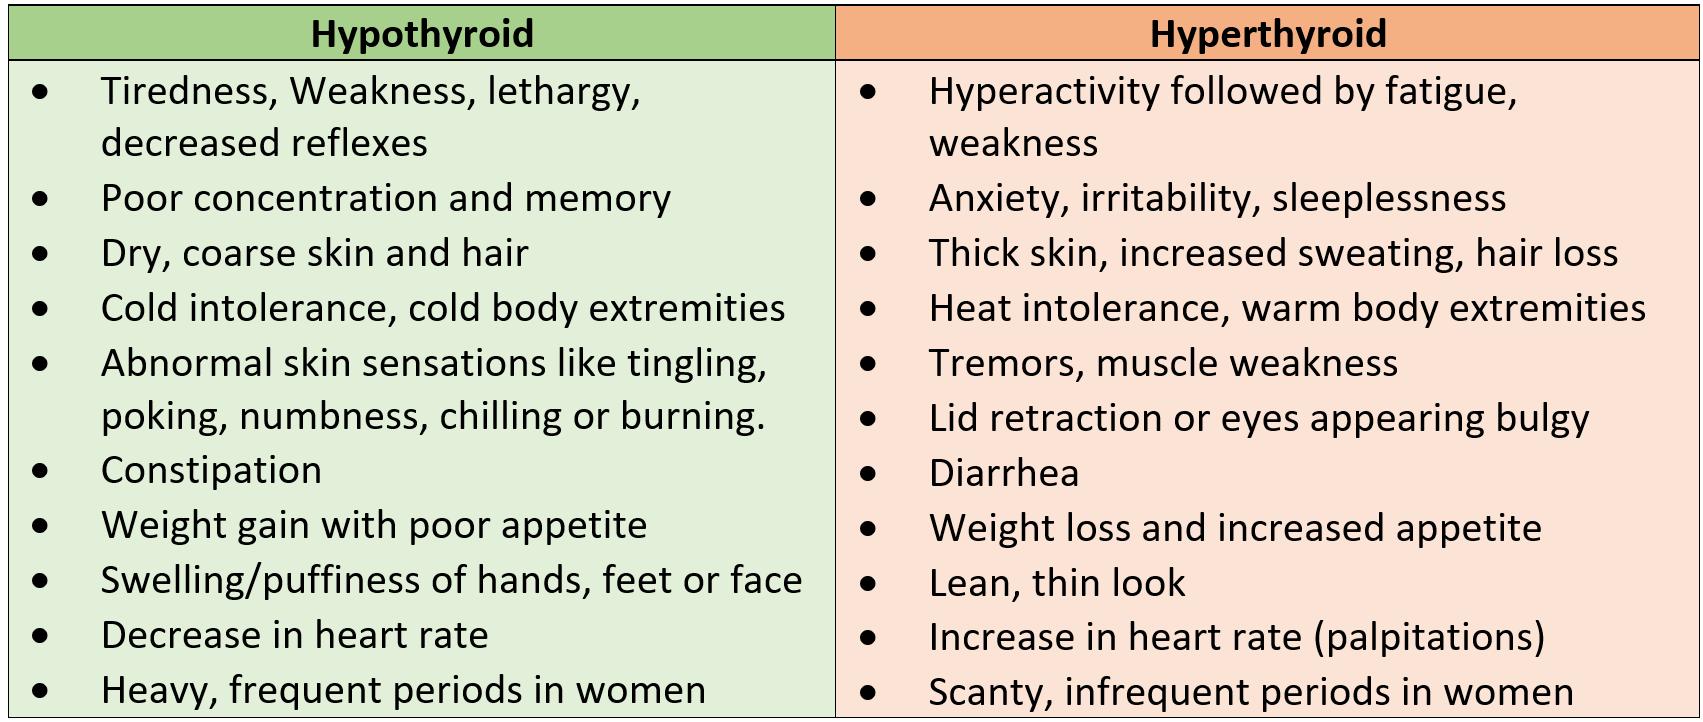 Hyperthyroid versus Hypothyroid